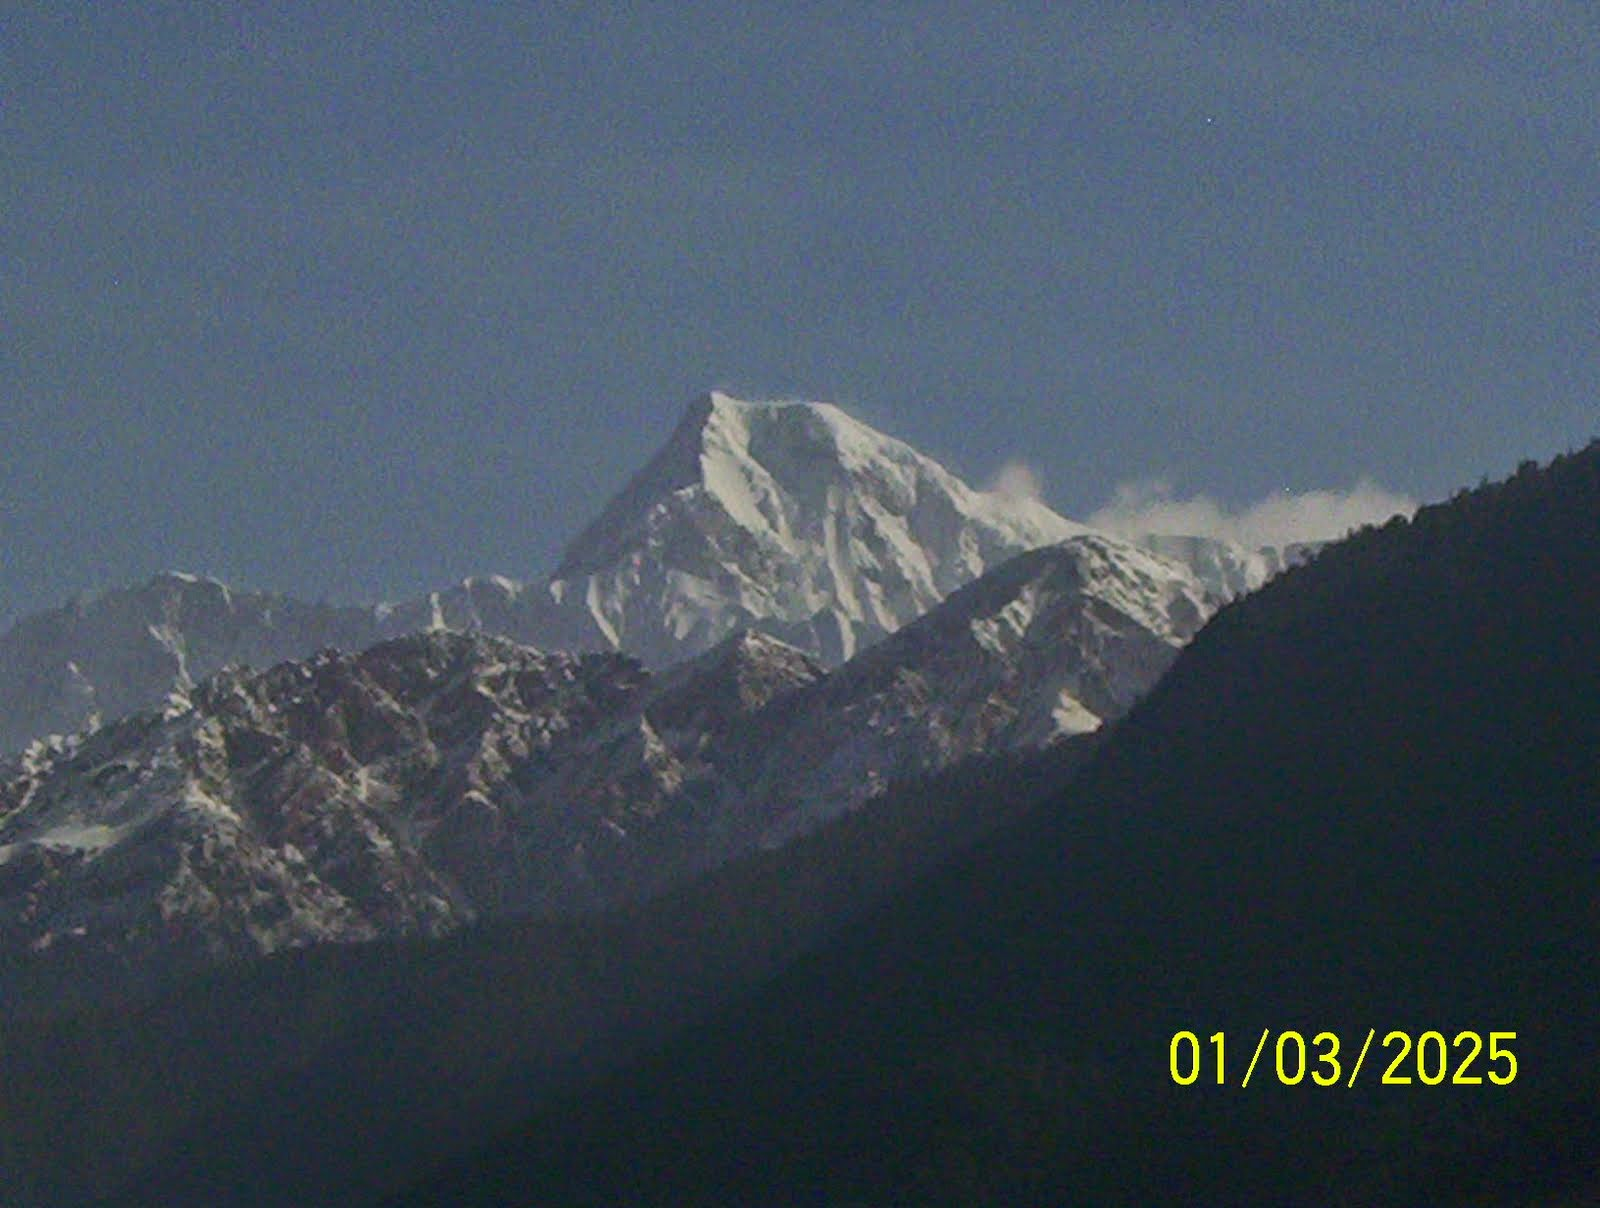 himalayas in uttarakhand garhwal